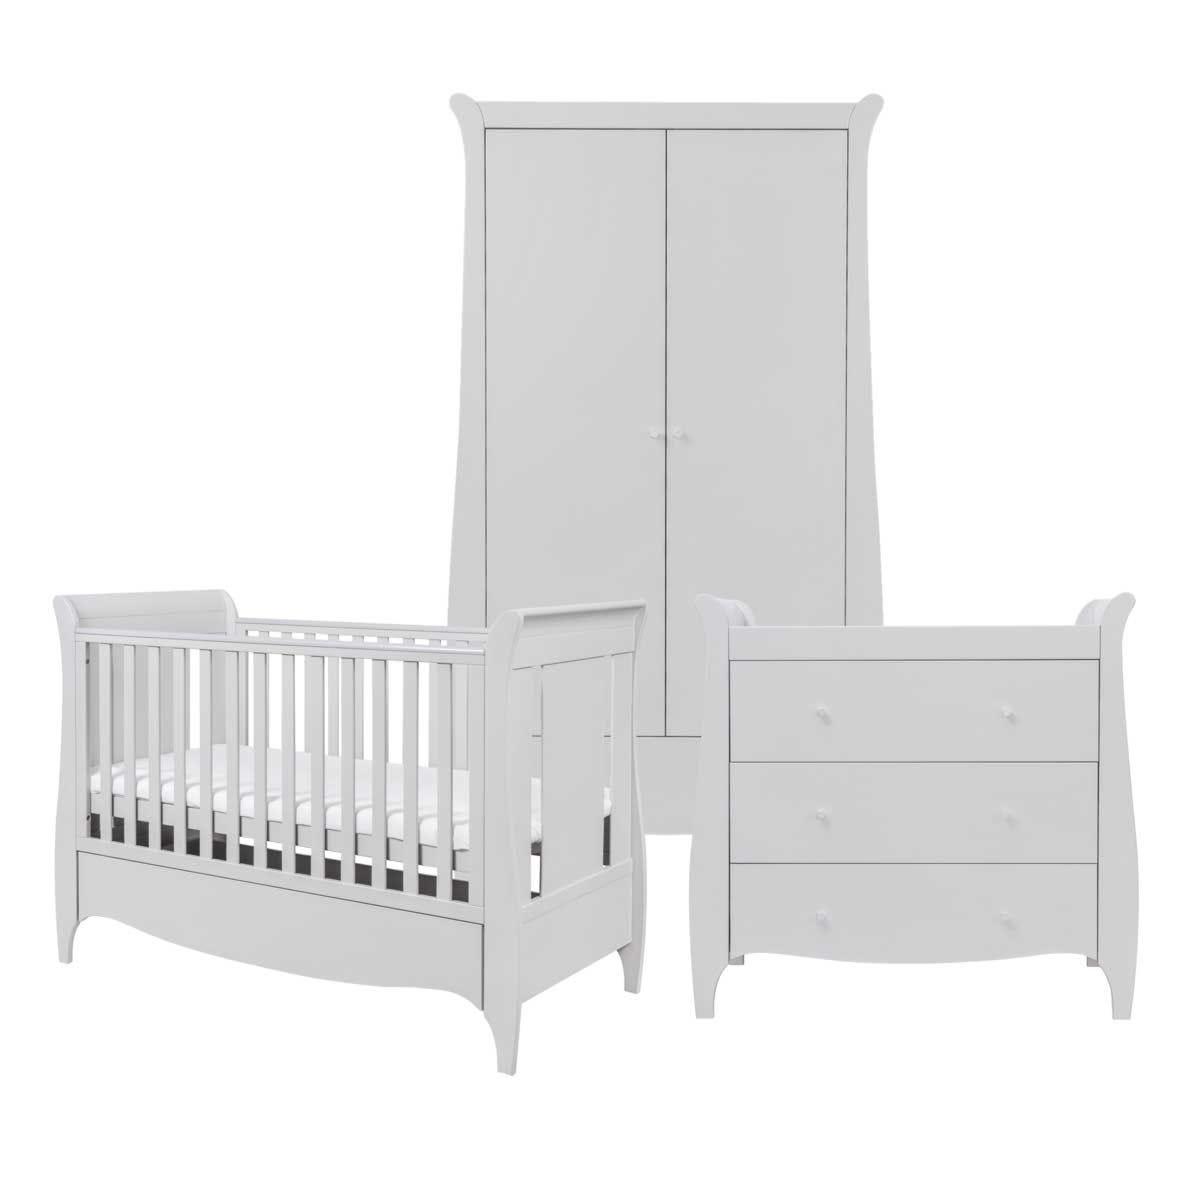 Tutti Bambini Roma 3 Piece Cot, Chest Changer and Wardrobe Room Set - Dove Grey